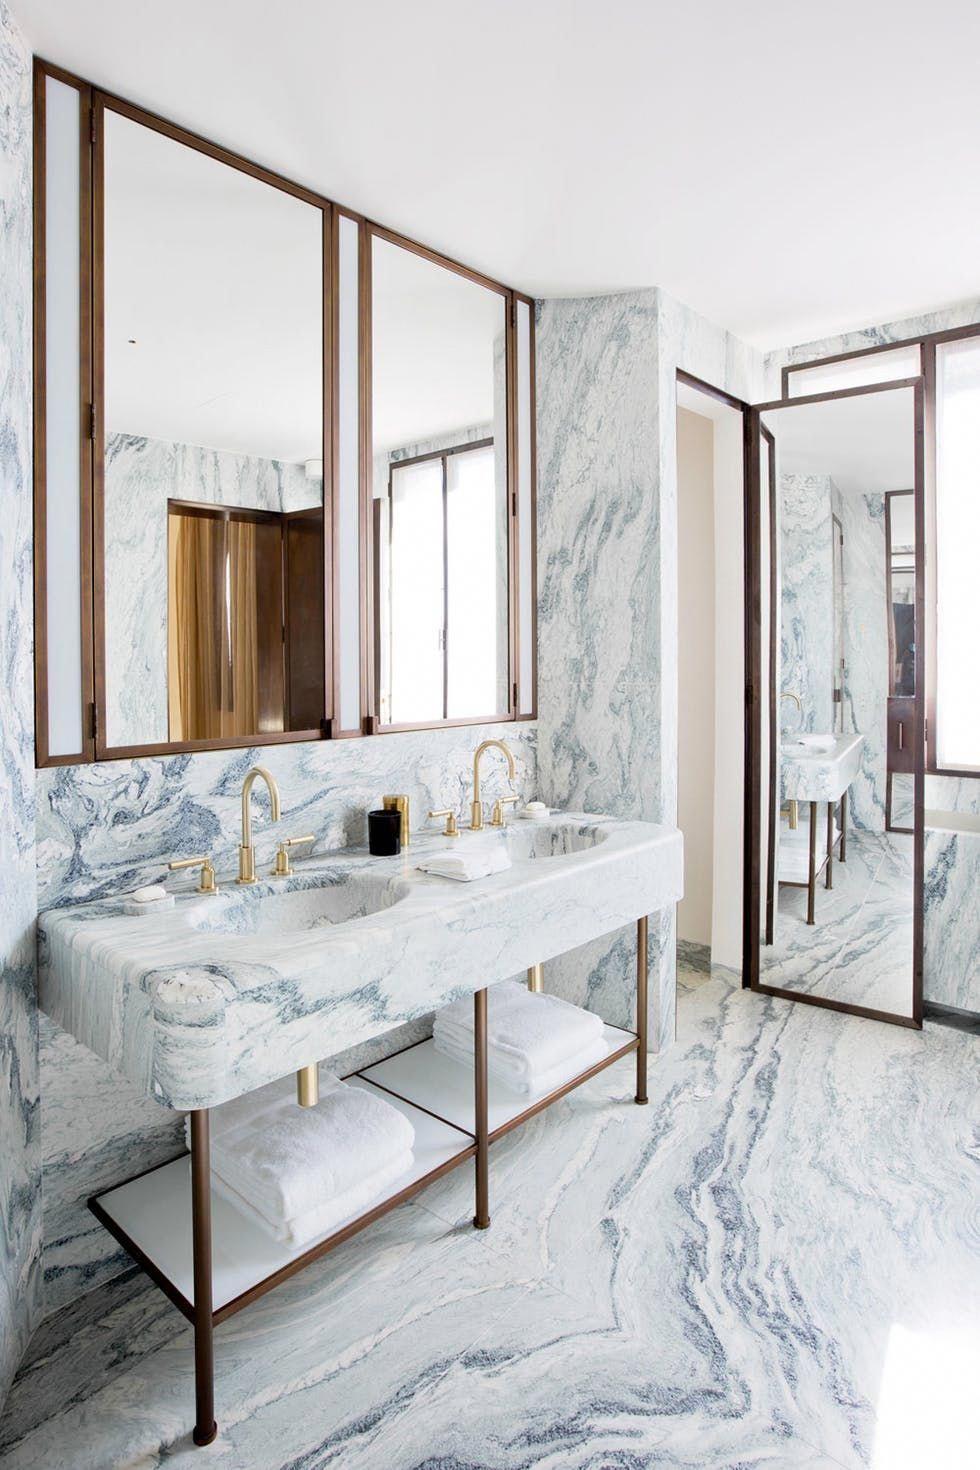 Bathroom Ideas On A Budget Uk Bathroom Interior Design Bathroom Design Luxury Bathroom